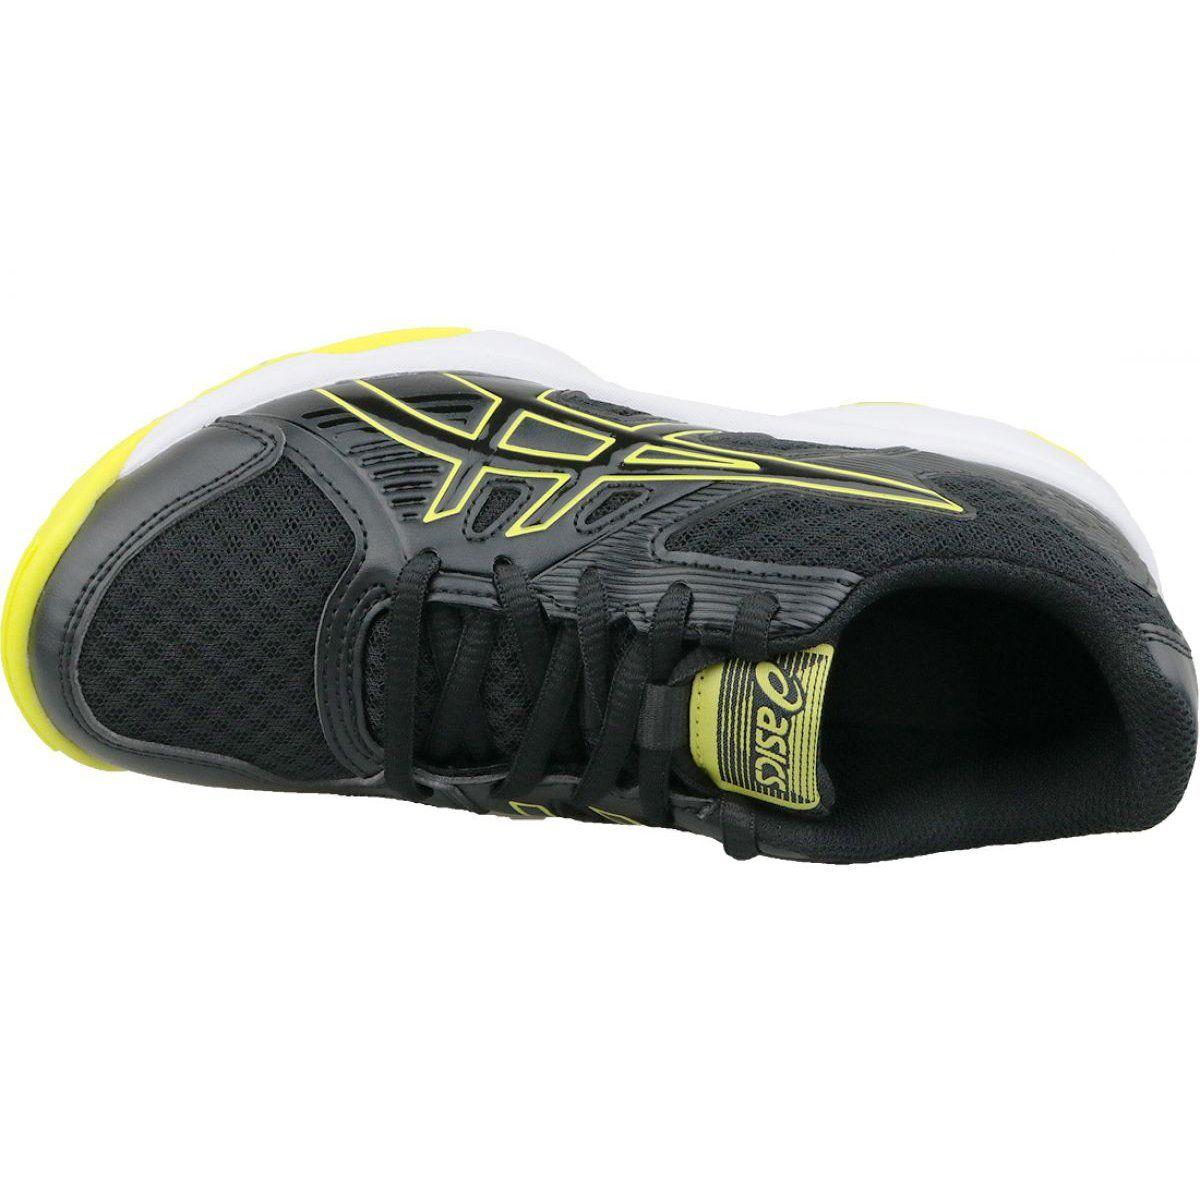 Buty Do Siatkowki Asics Upcourt 3 Gs Jr 1074a005 003 Czarne Szare Volleyball Shoes Shoes Asics